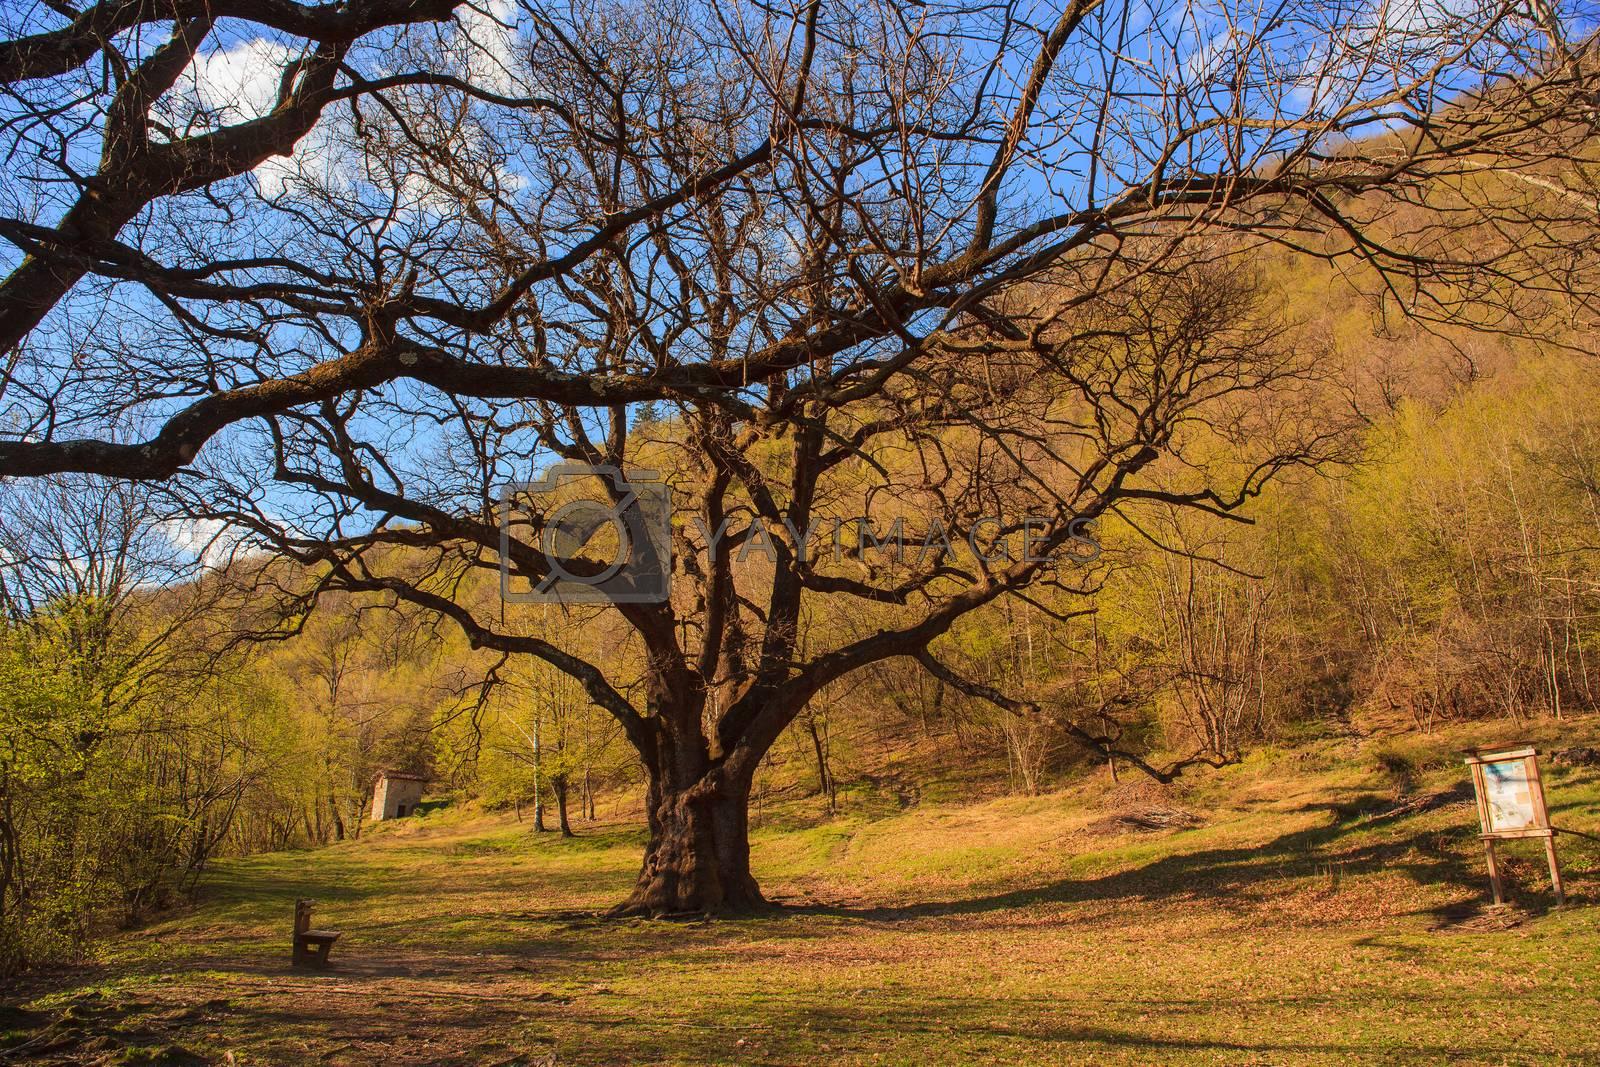 View of big oak in the field near Porlezza, Italy